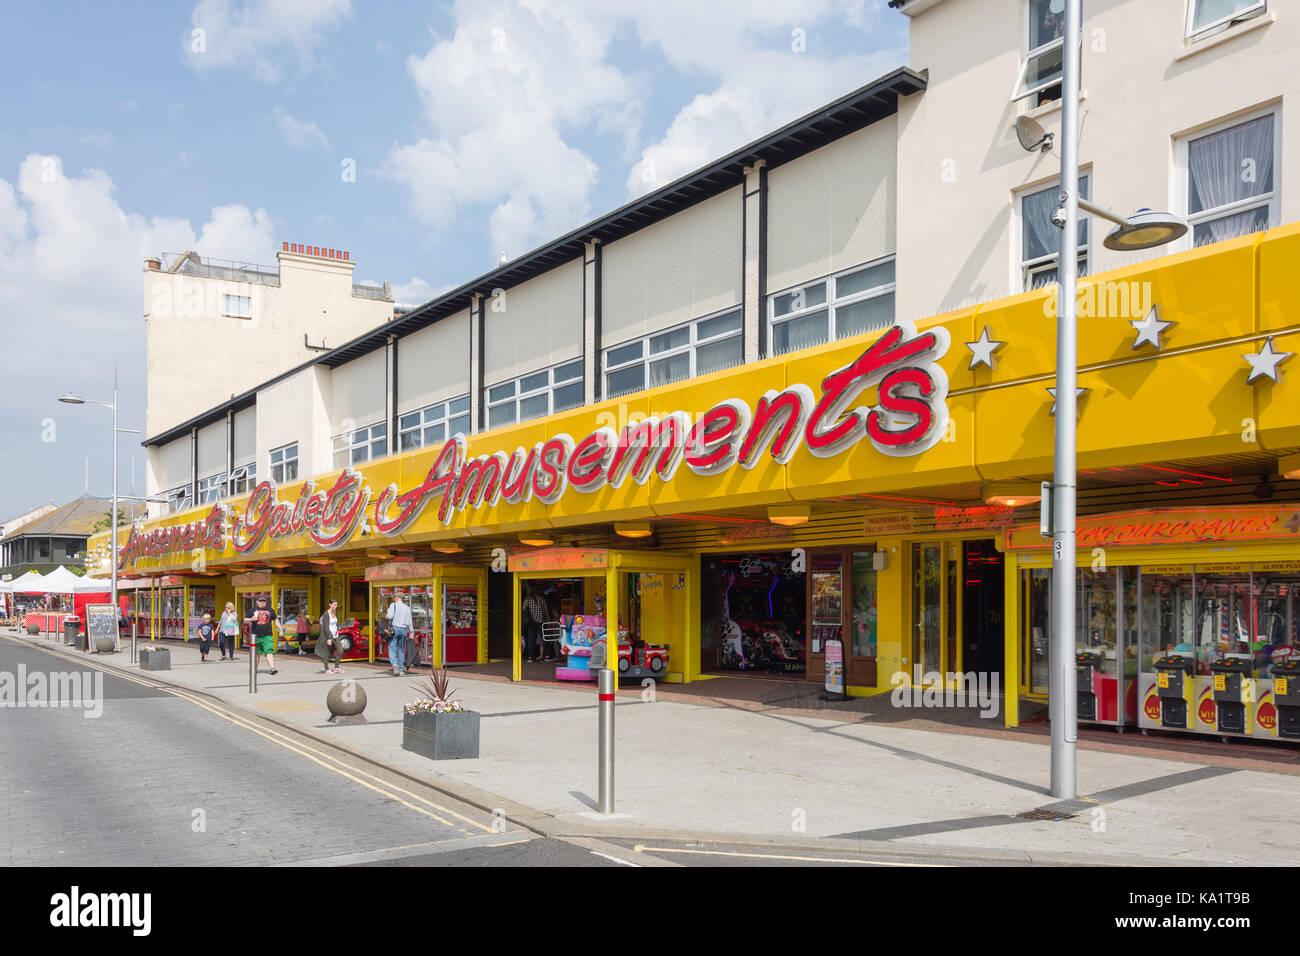 Gaiety Amusement Arcade, Pier Avenue, Clacton-on-Sea, Essex, England, United Kingdom - Stock Image